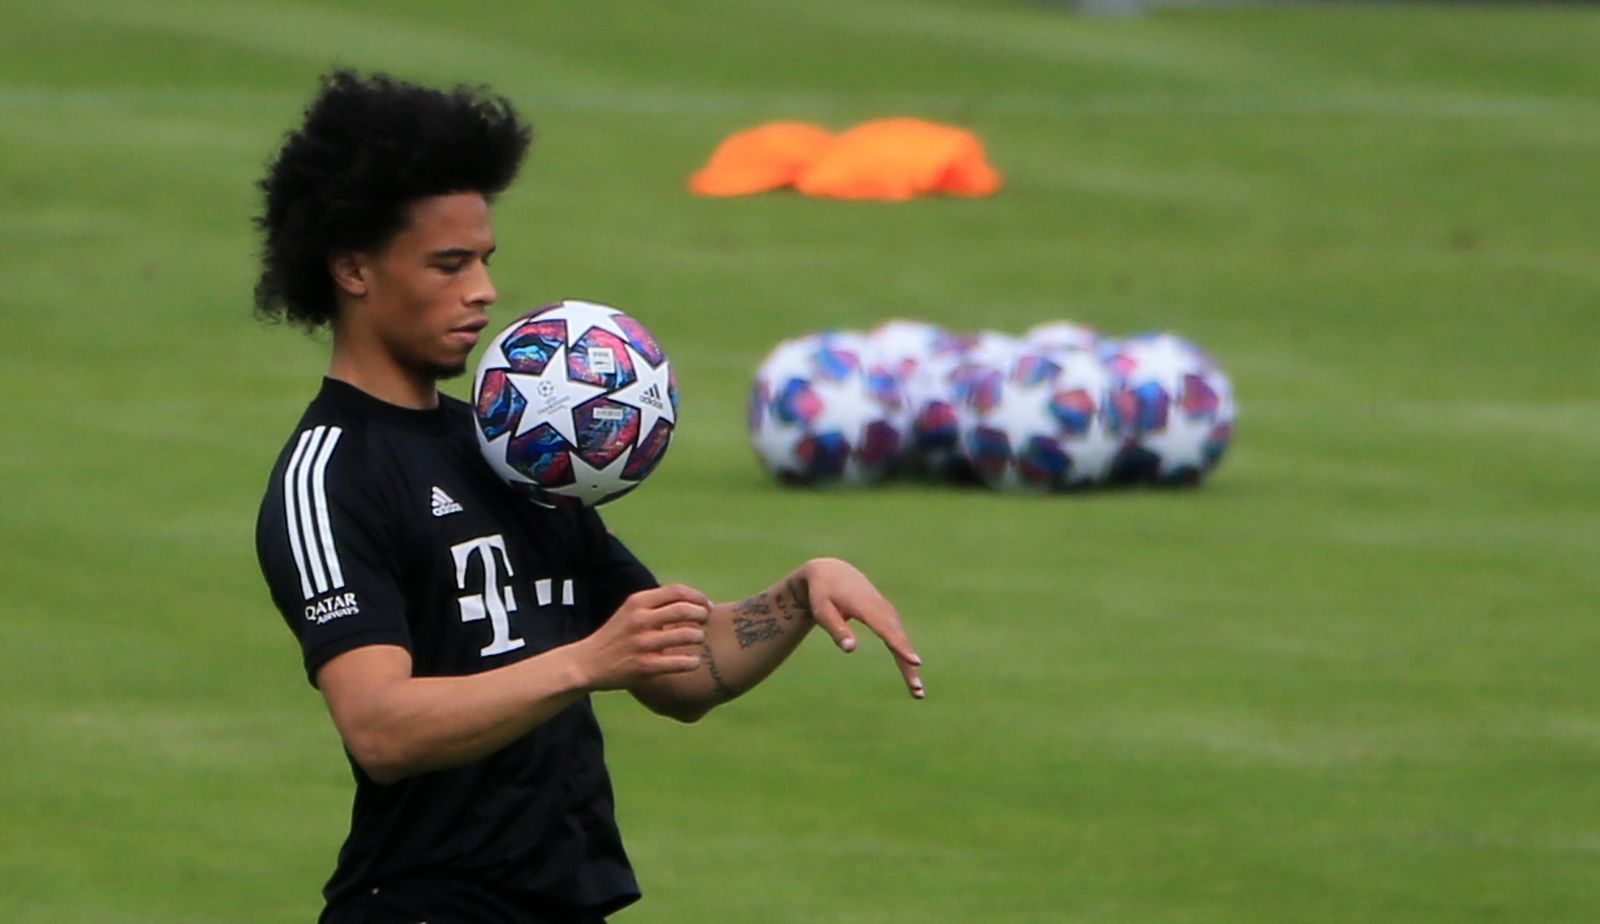 24.07.2020, FC Bayern Trainingsgelaende, Saebenerstrasse, Muenchen, im Bild: Leroy Sane (FCB) *** 24 07 2020, FC Bayern